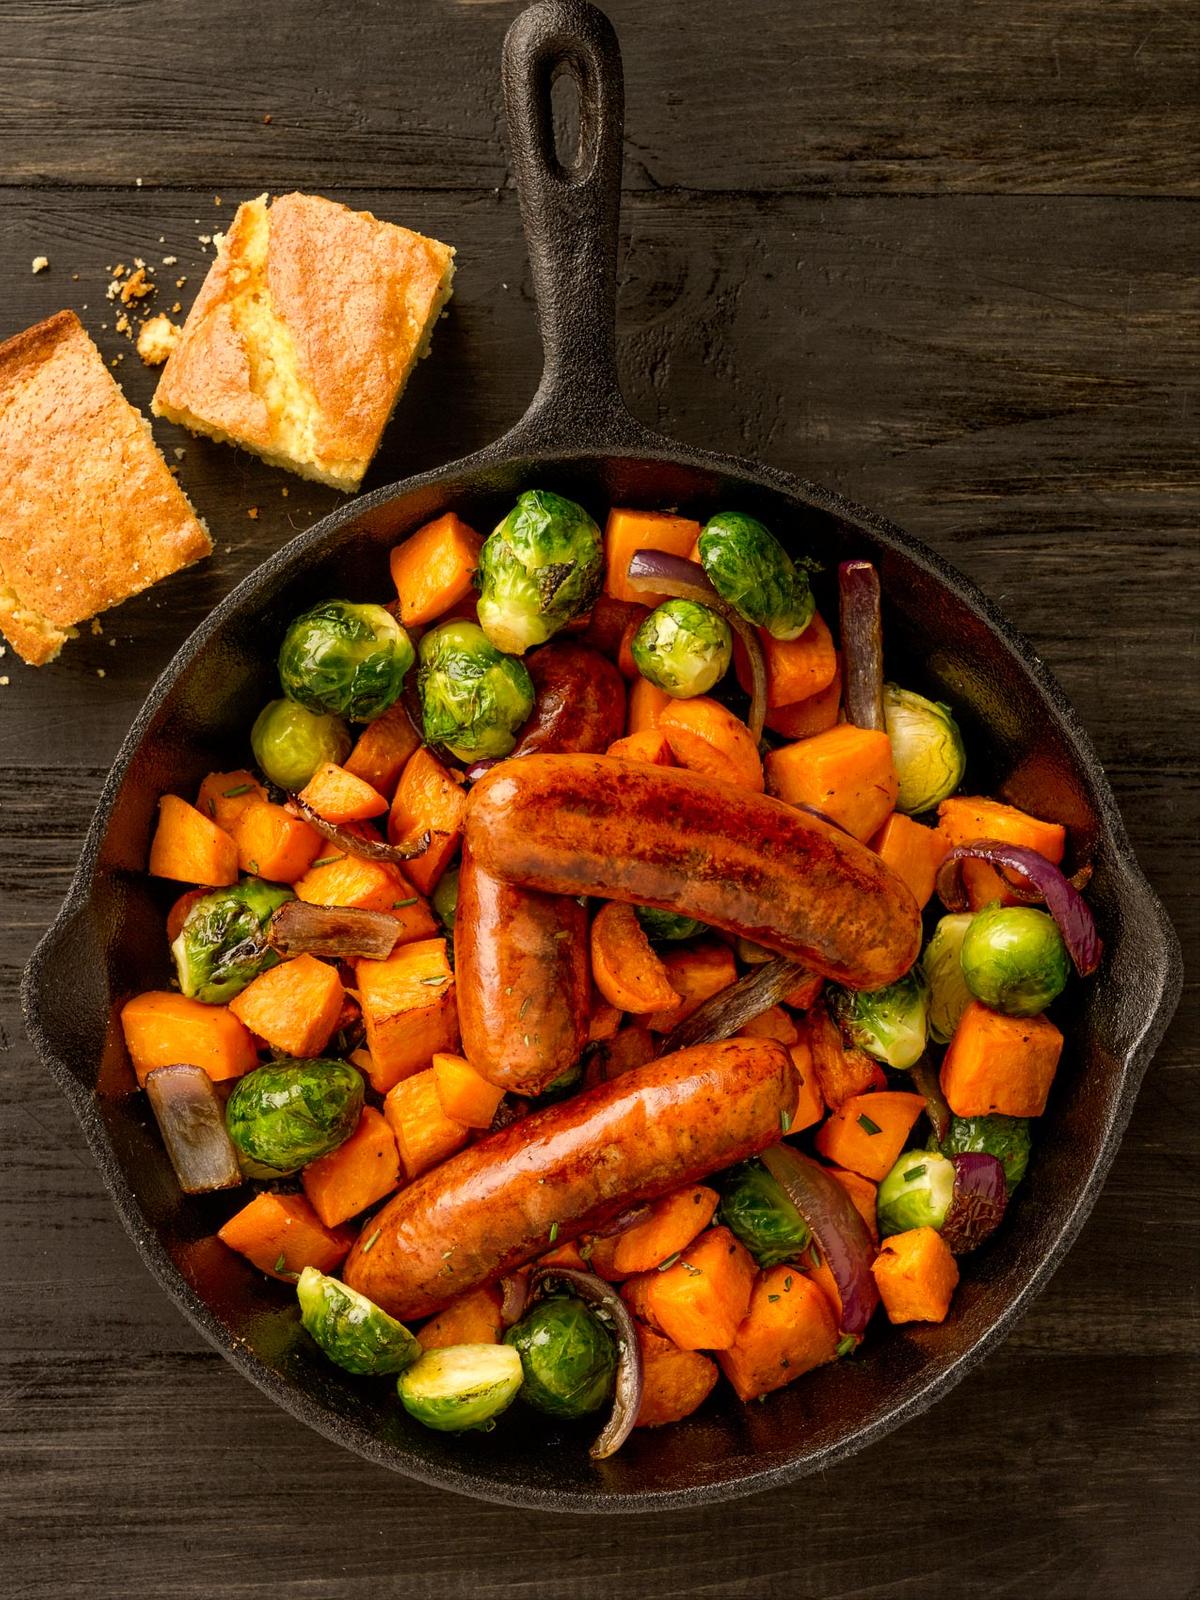 Skillet Sausage Recipe